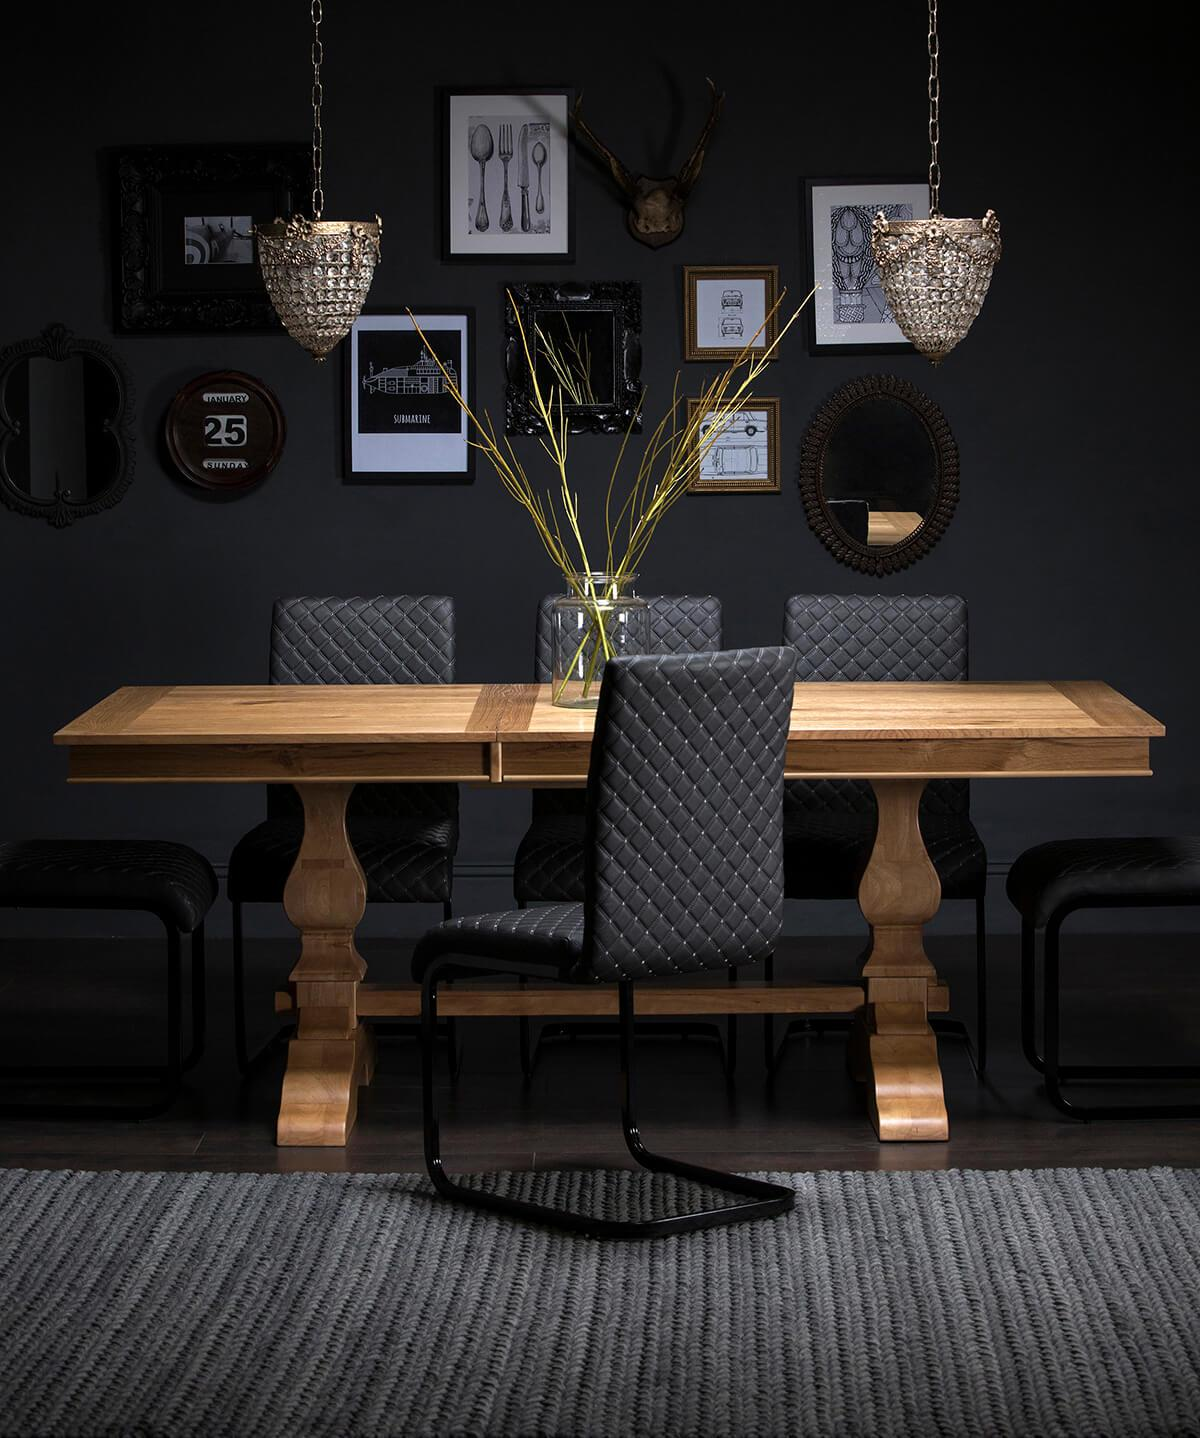 Cavendish Oak Extending Dining Table - 160 - 200cm